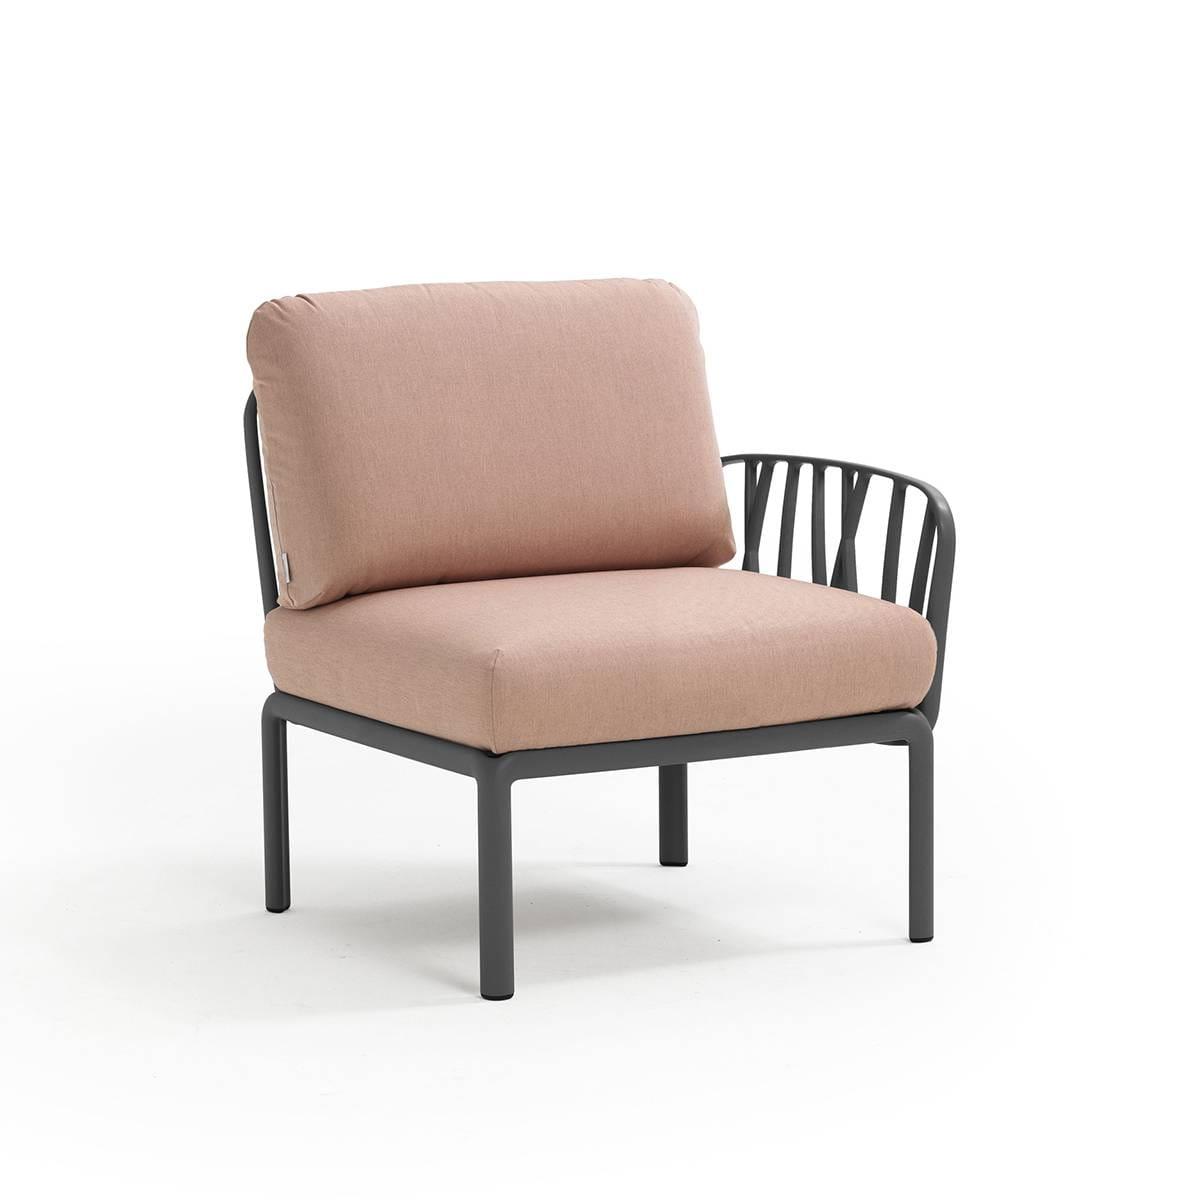 Nardi Sofa Komodo E. Terminale Antracyt-Rosa